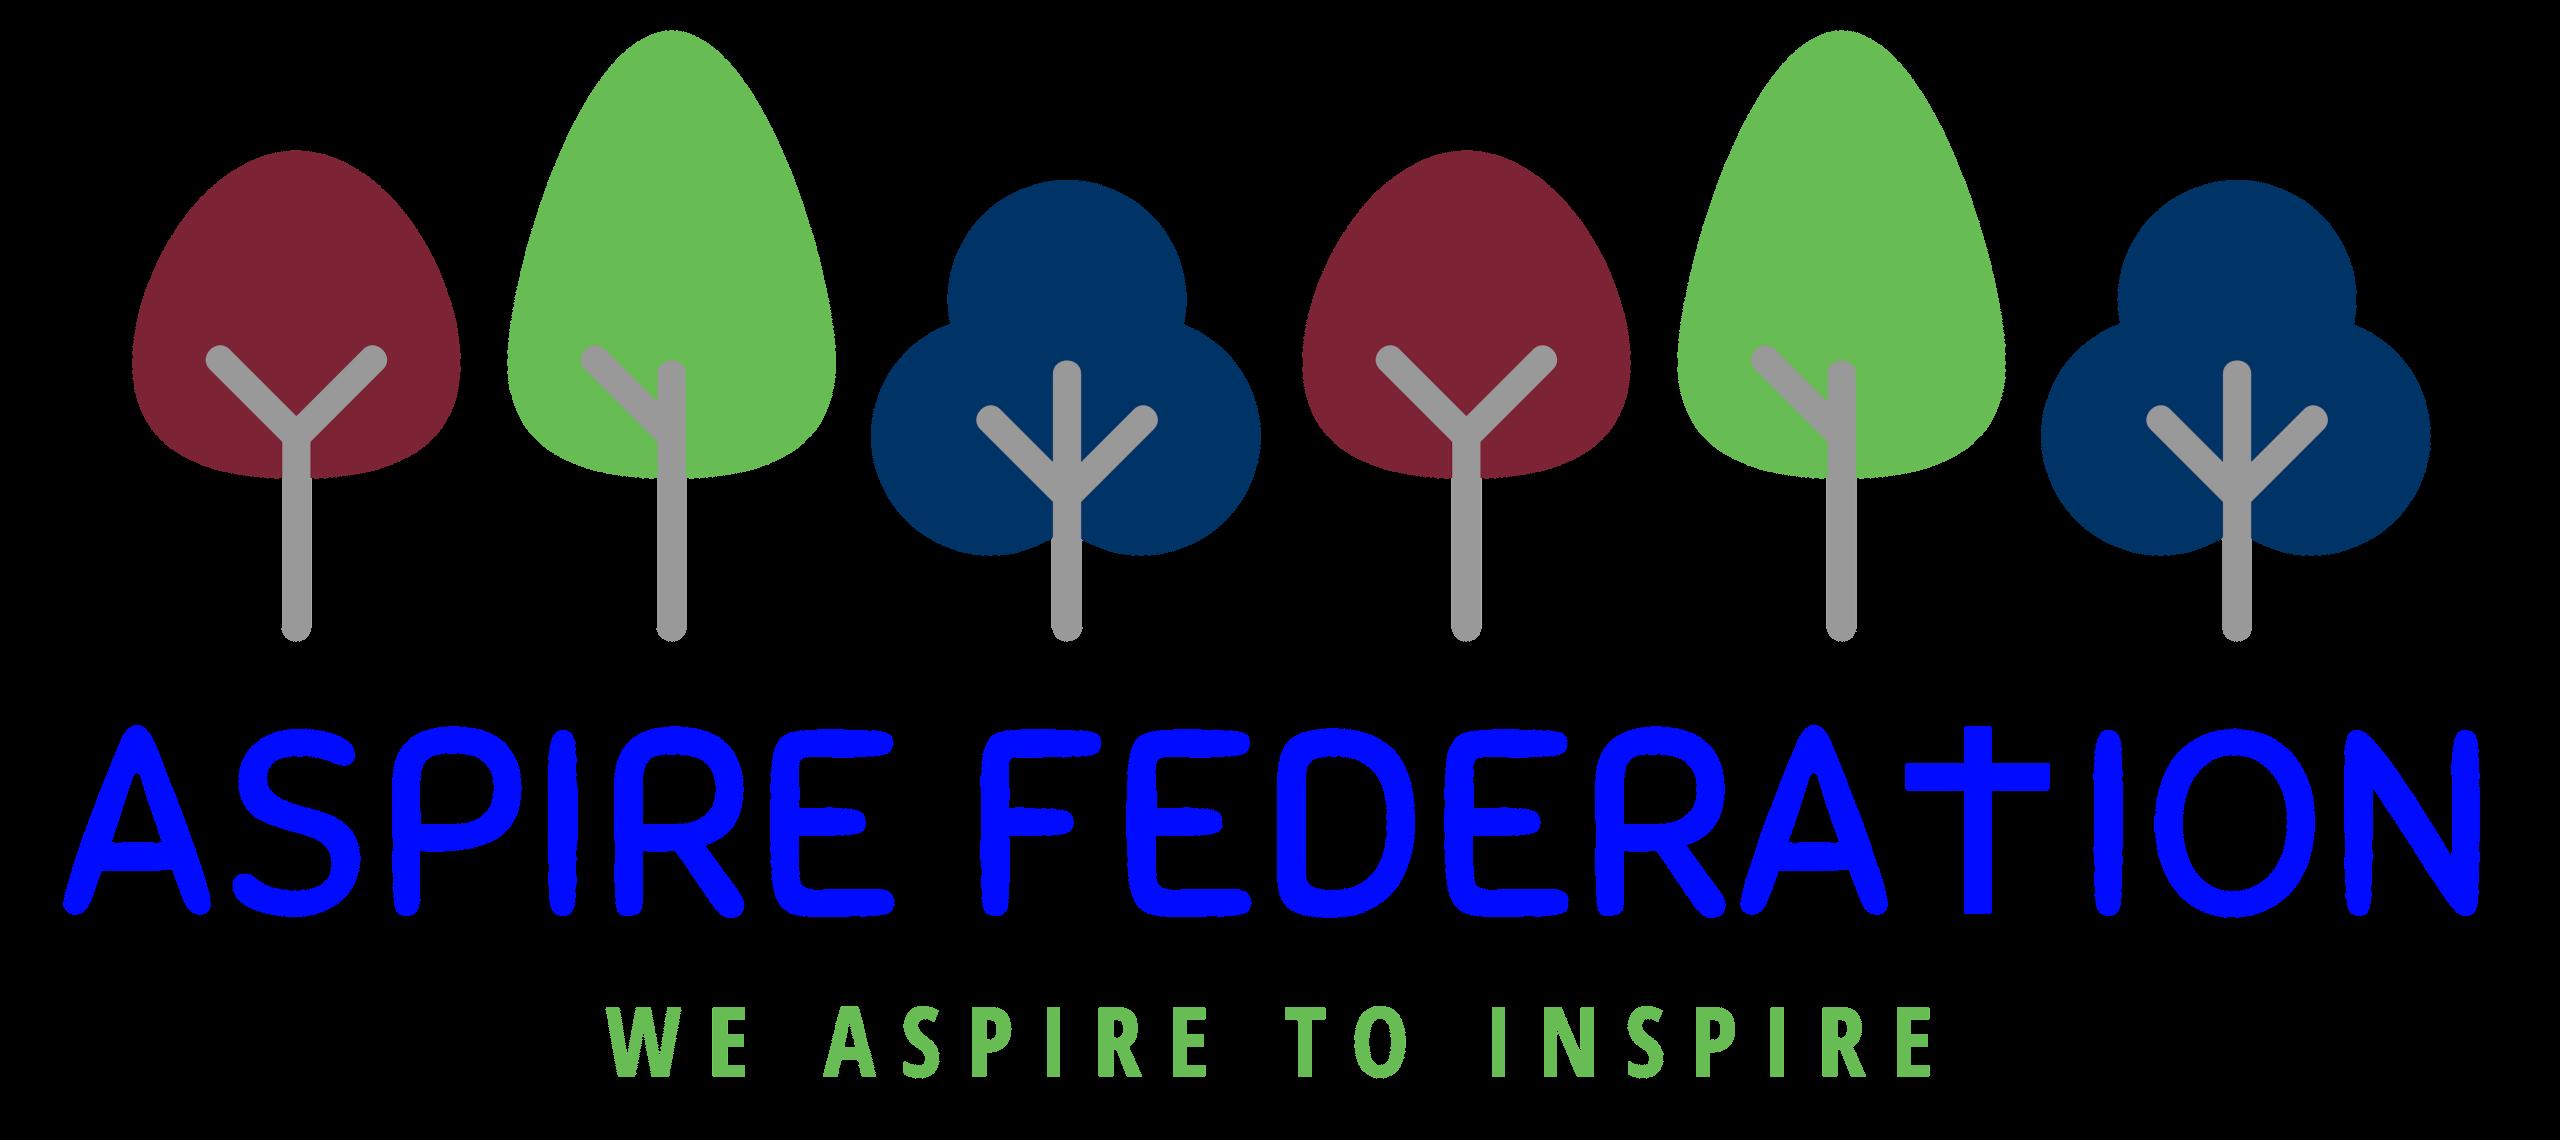 ASPIRE Federation – We Aspire to Inspire